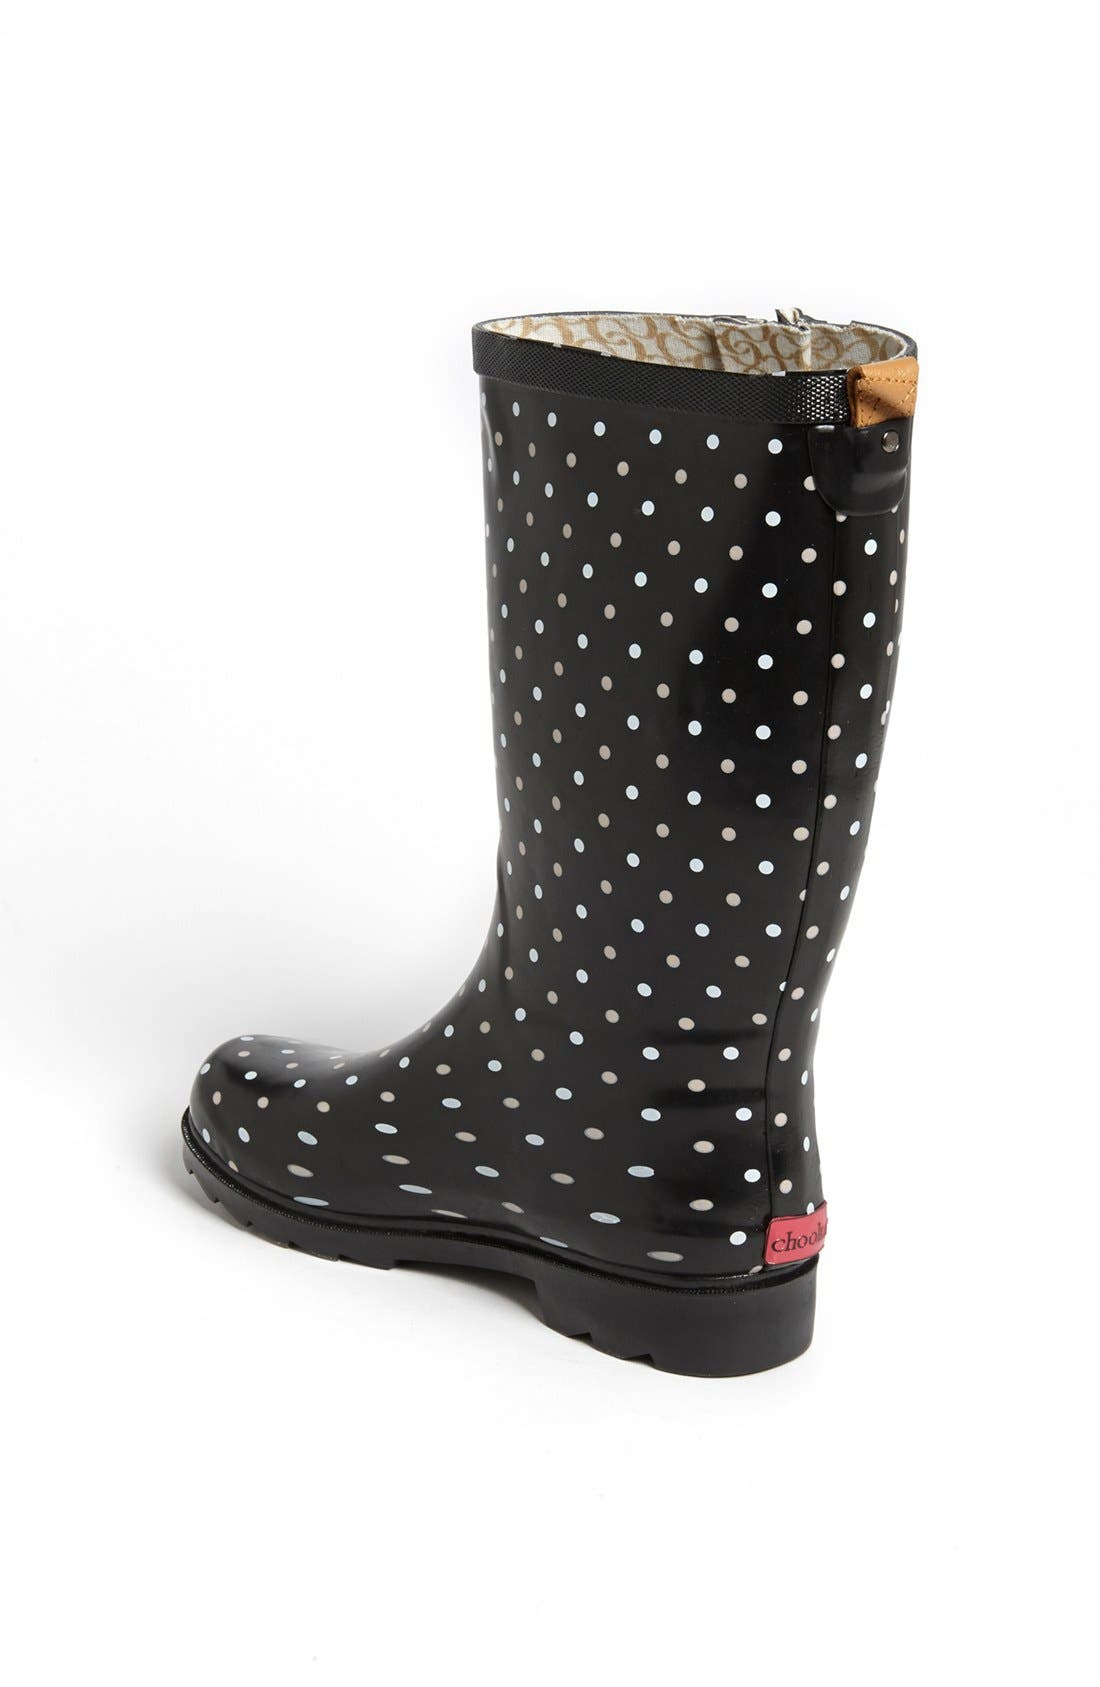 Alternate Image 2  - Chooka 'Classical Dot' Rain Boot (Women)